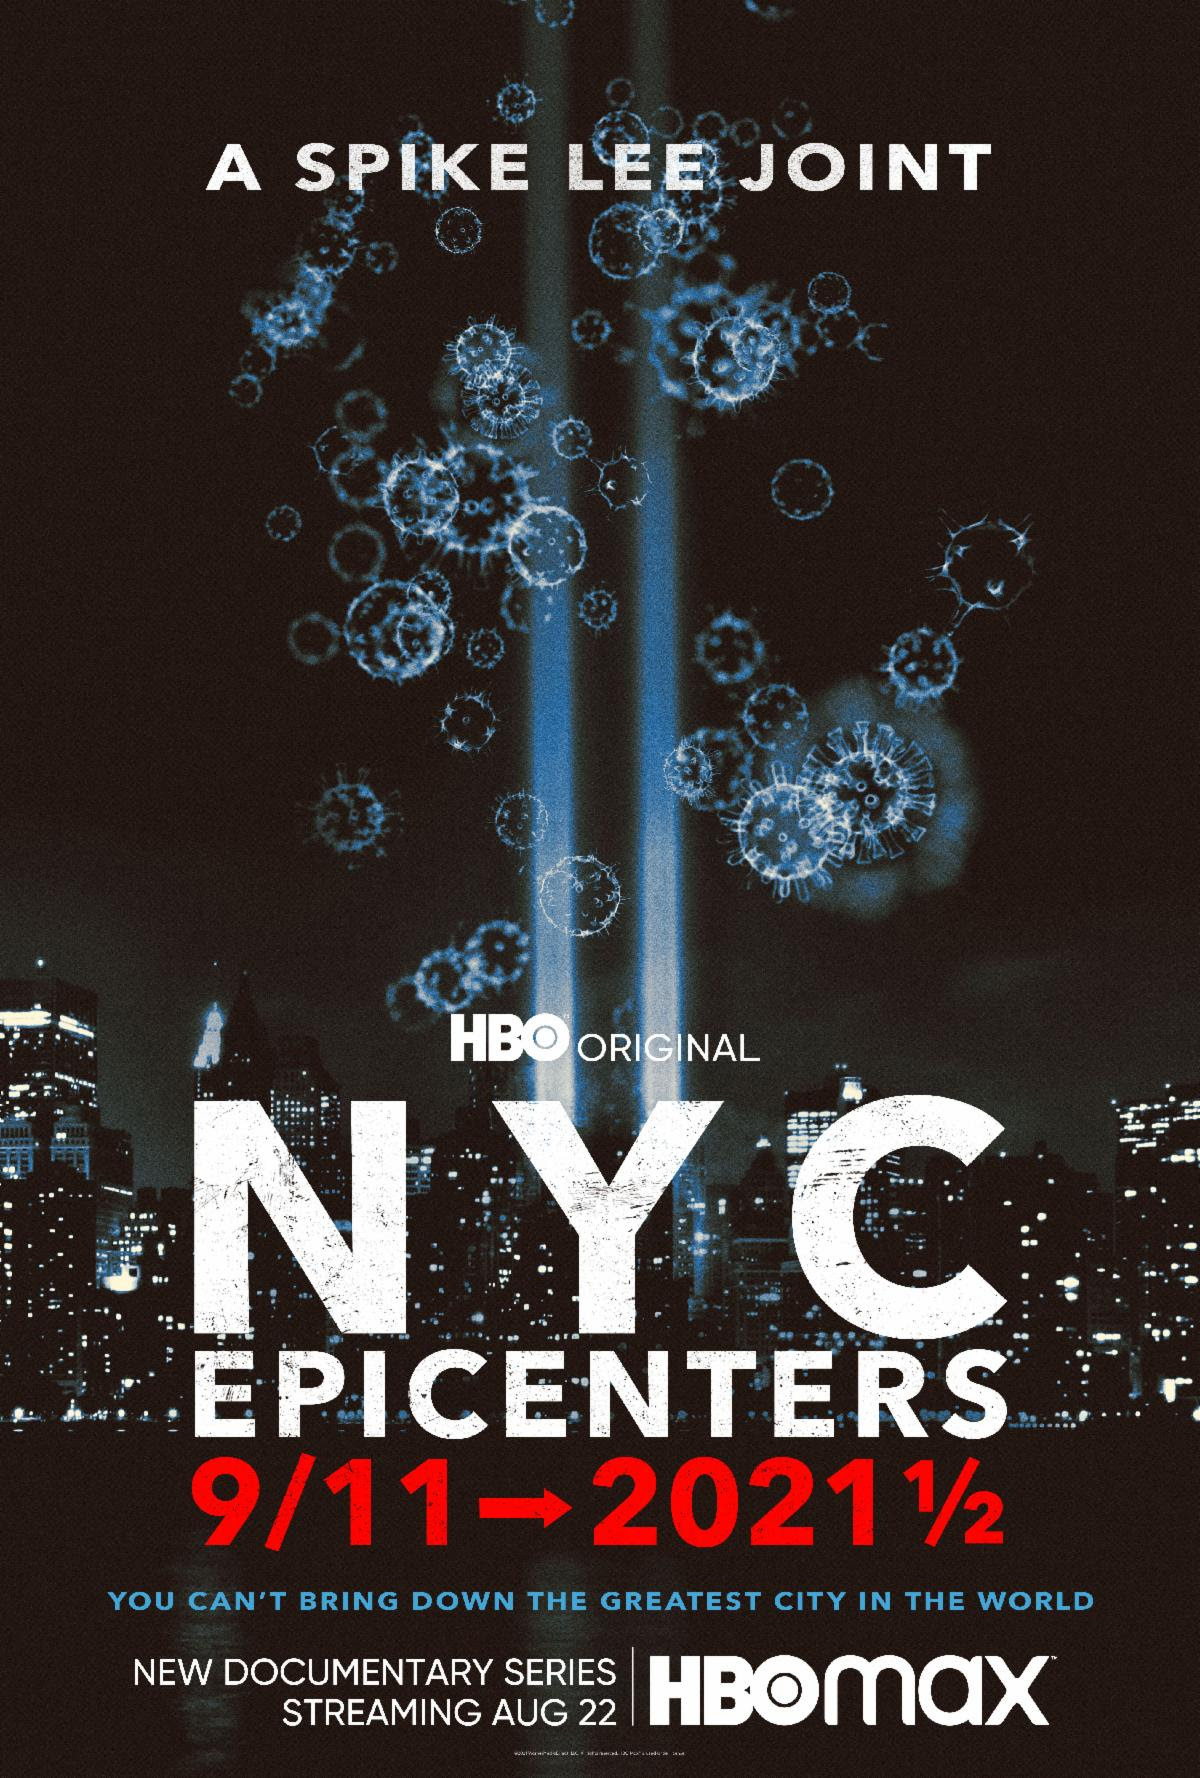 Centros da cidade de Nova York: pôster de 11 de setembro a 2021